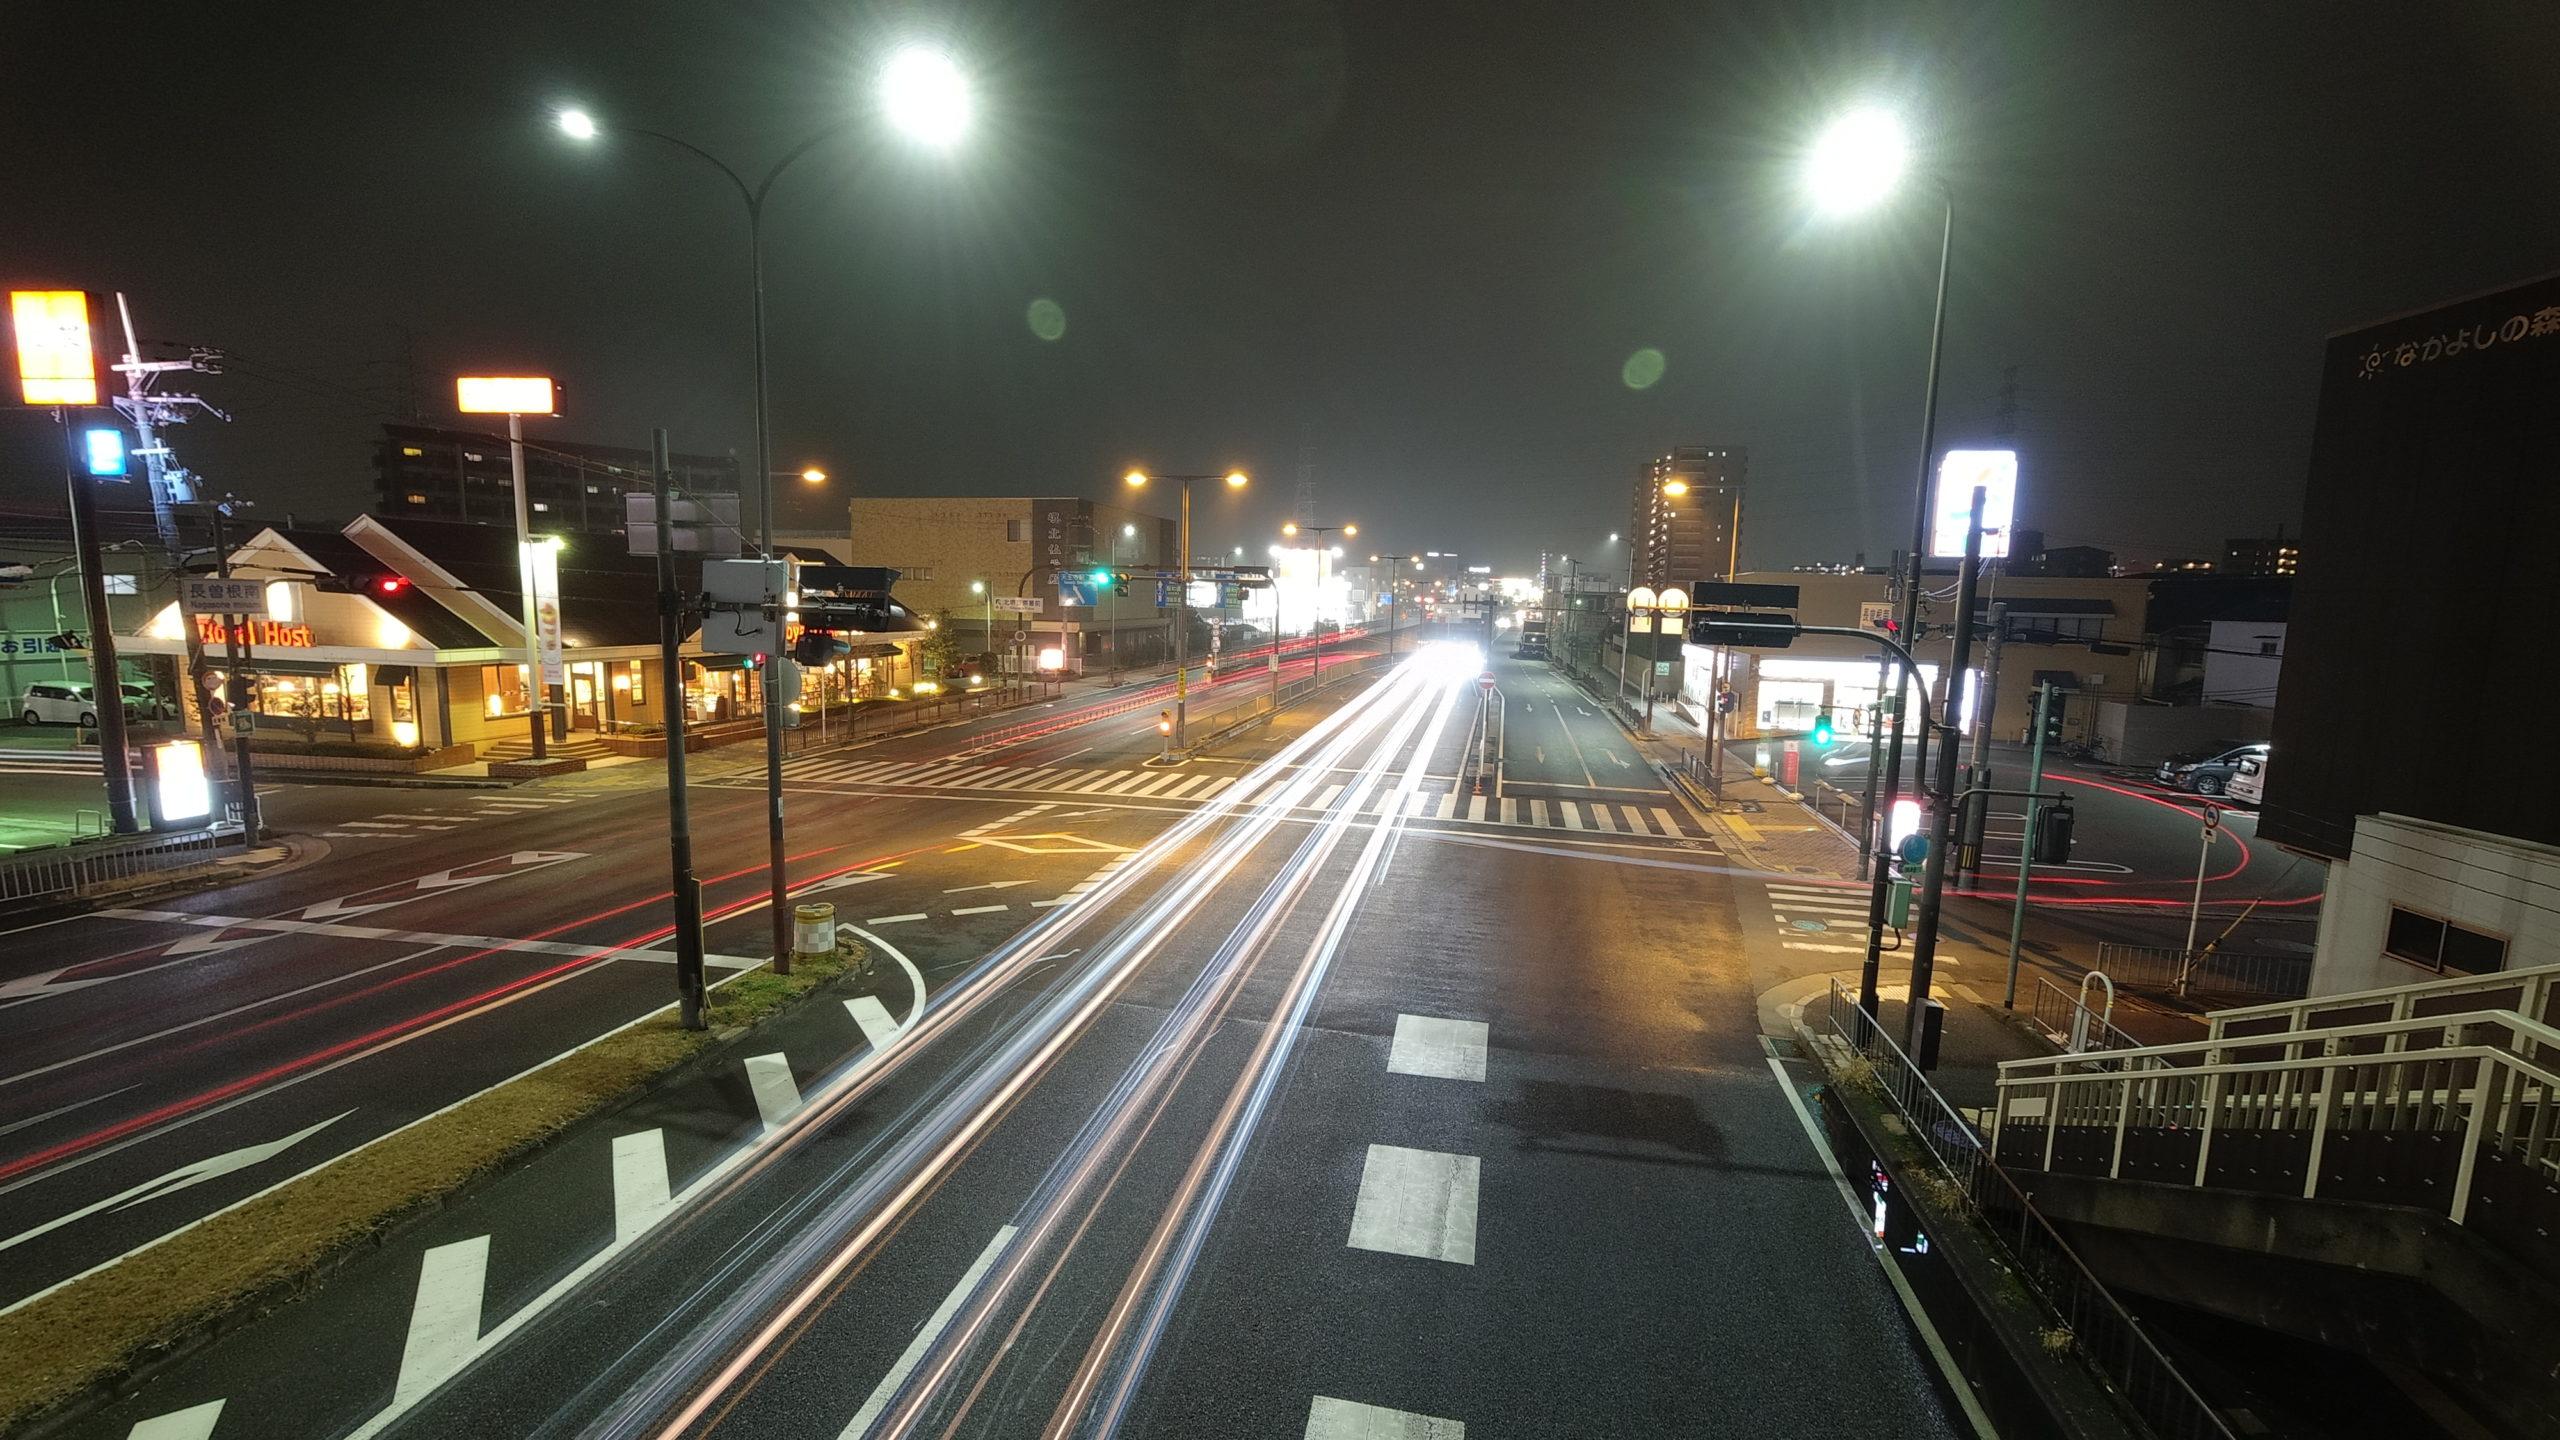 DJI Osmoactionで車の光跡撮影してみた、、、🙅♂️